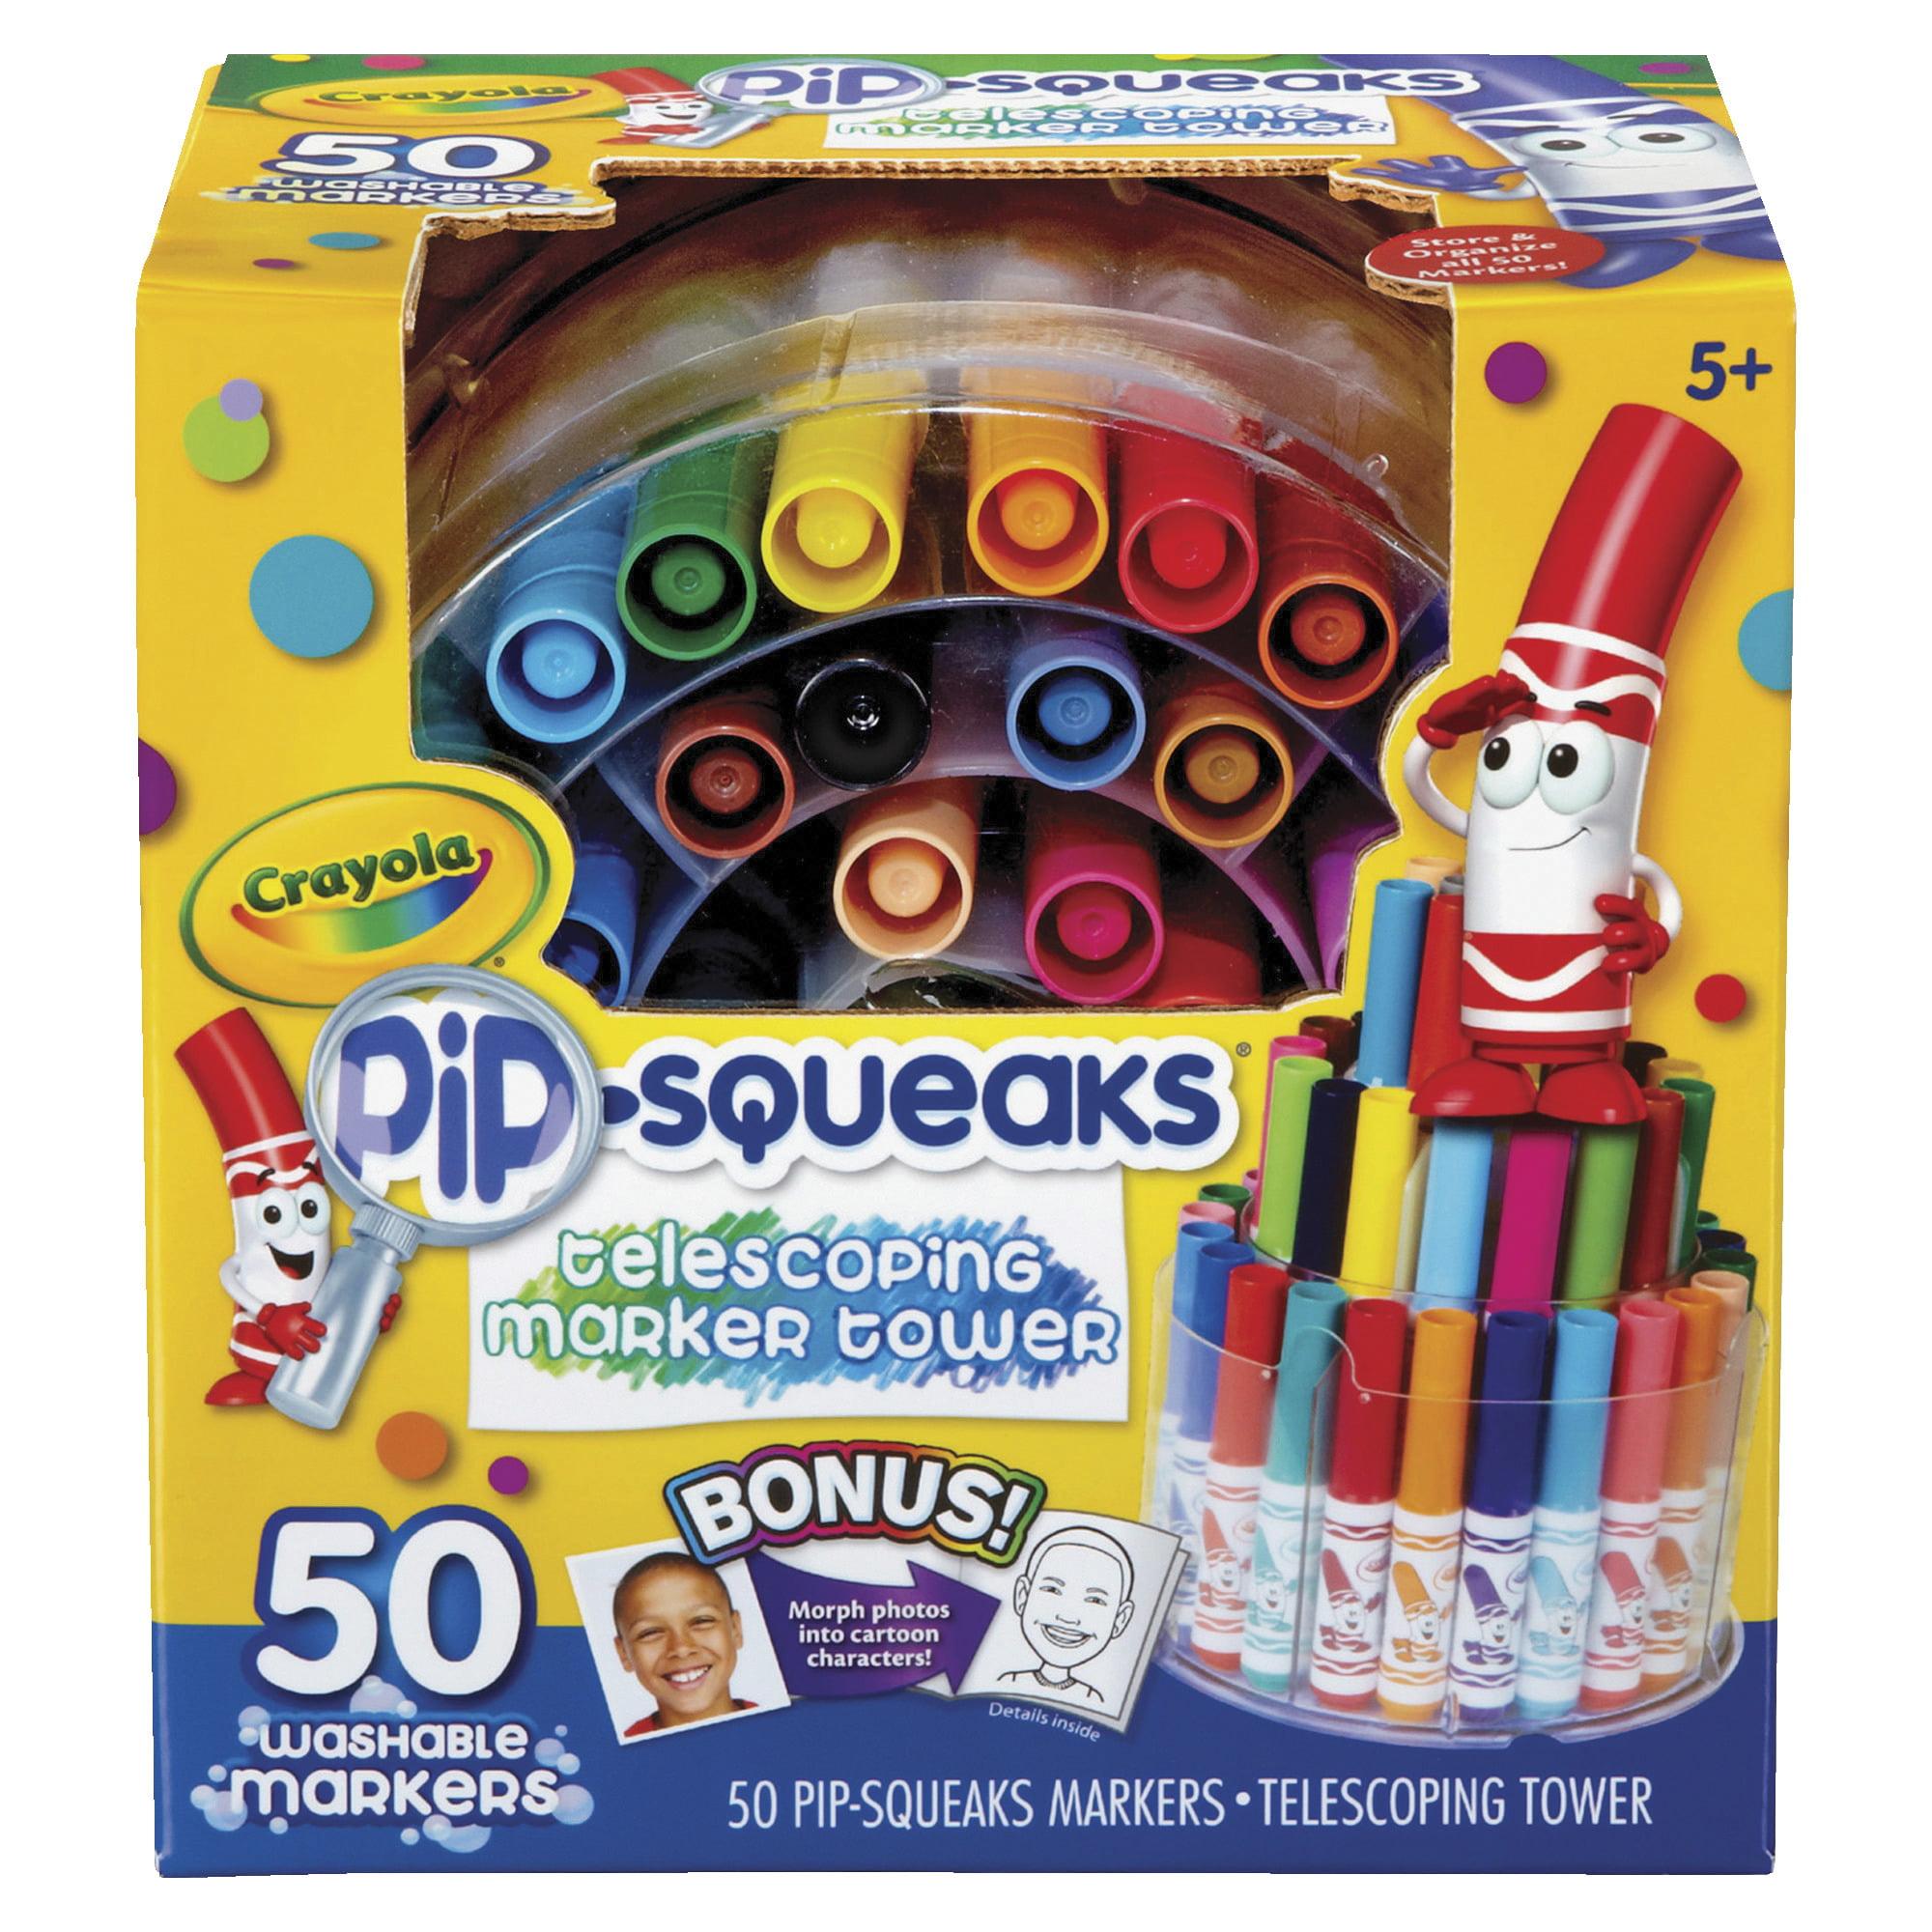 Crayola 50 Count Pip-Squeaks Marker Tower by Crayola LLC